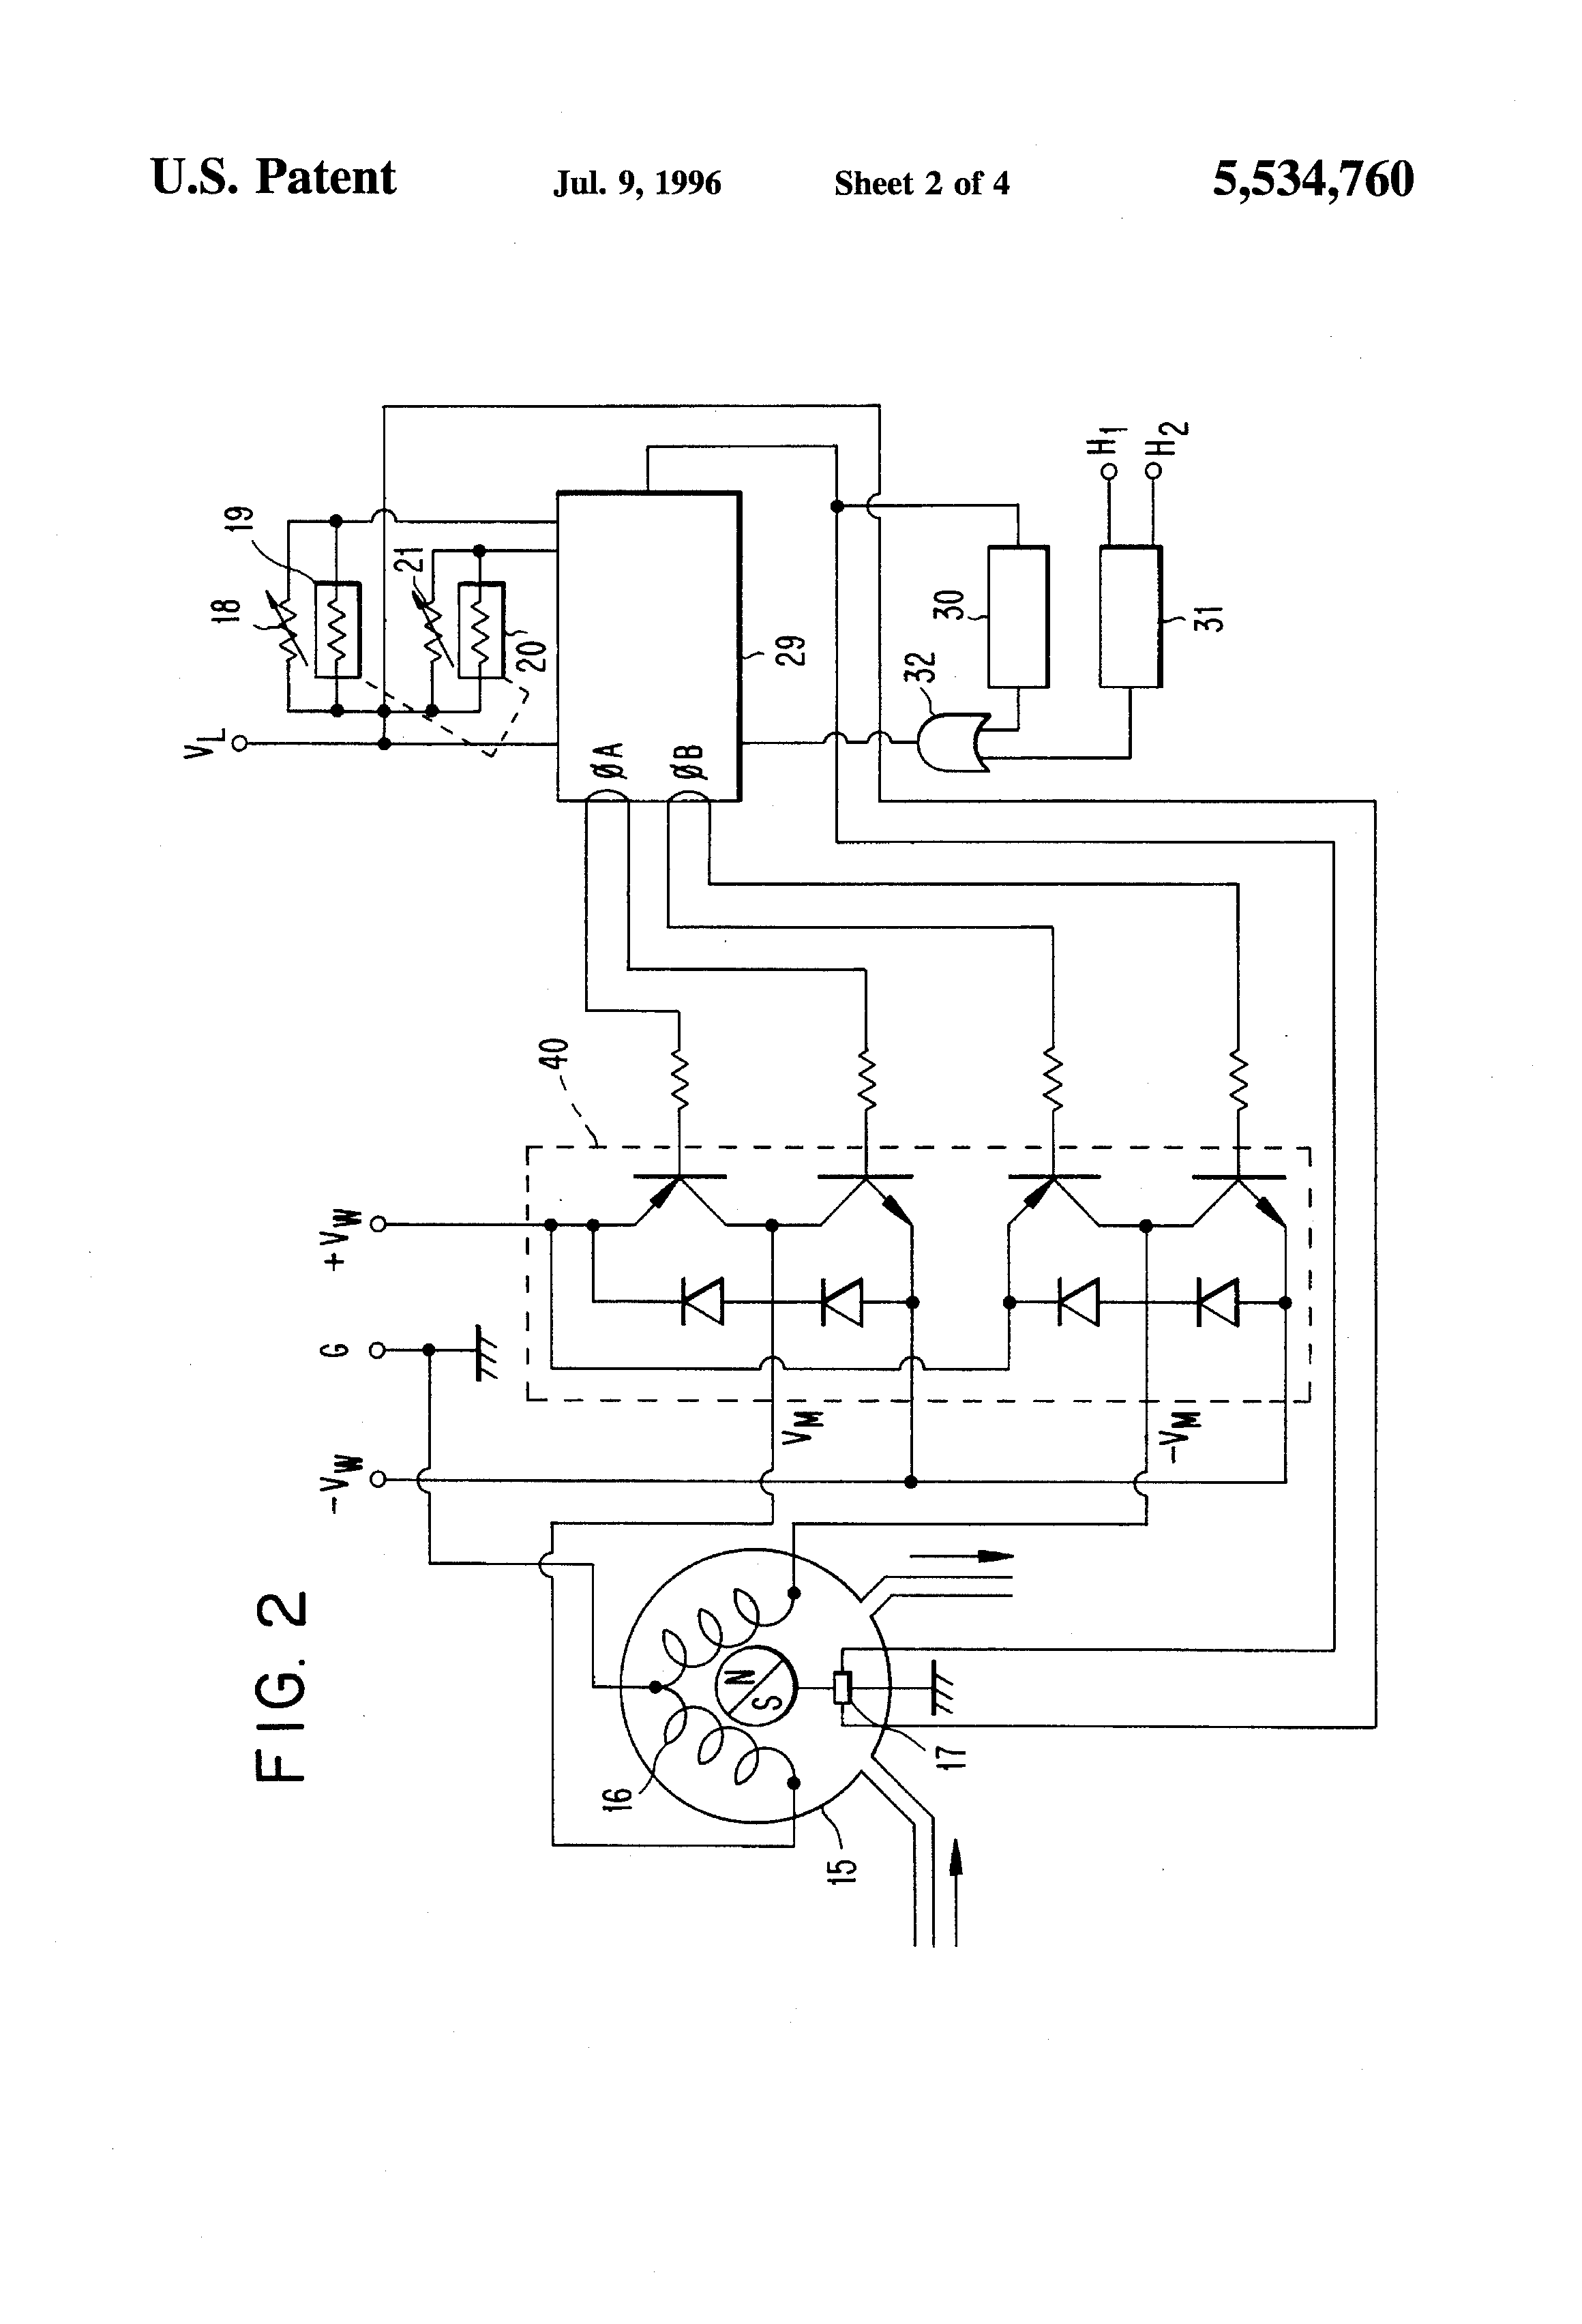 Hitachi Compressor Wire Diagram Wiring Diagrams 5 Relay 28 Jeffdoedesign Com A C 220 Volt 1 Phase